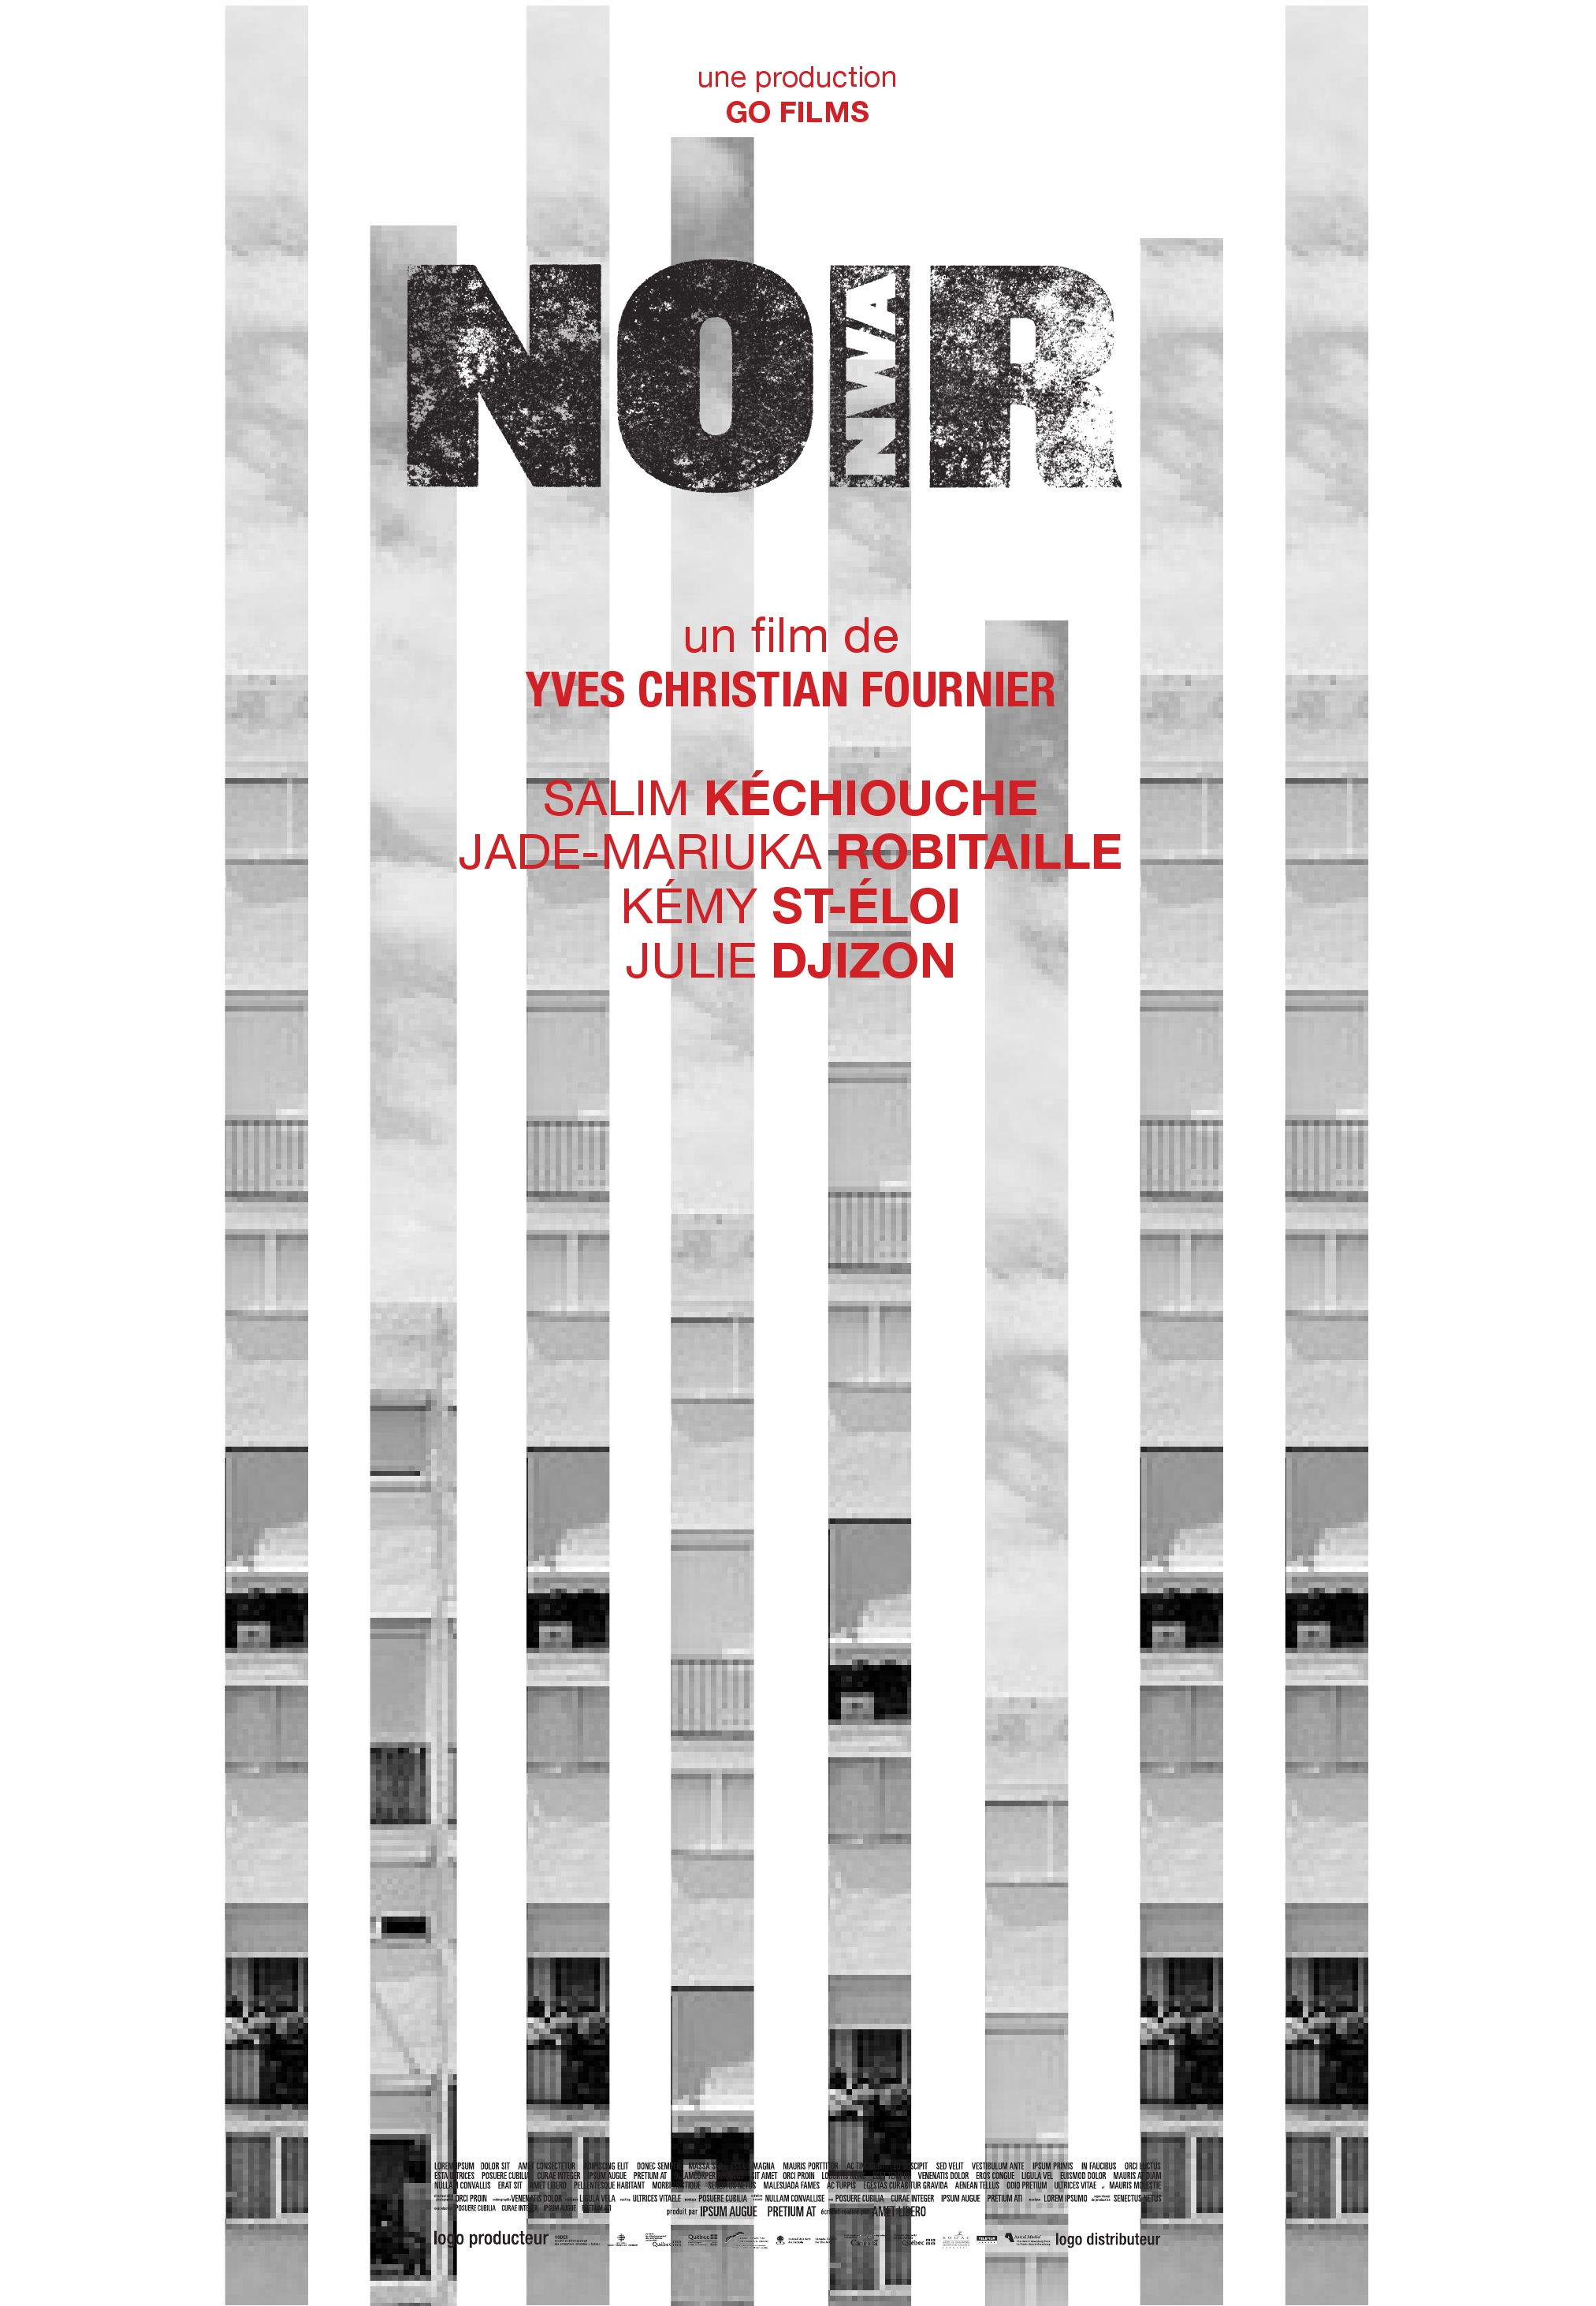 NOIR-Poster-RENZO-13oct-1_00021.jpg